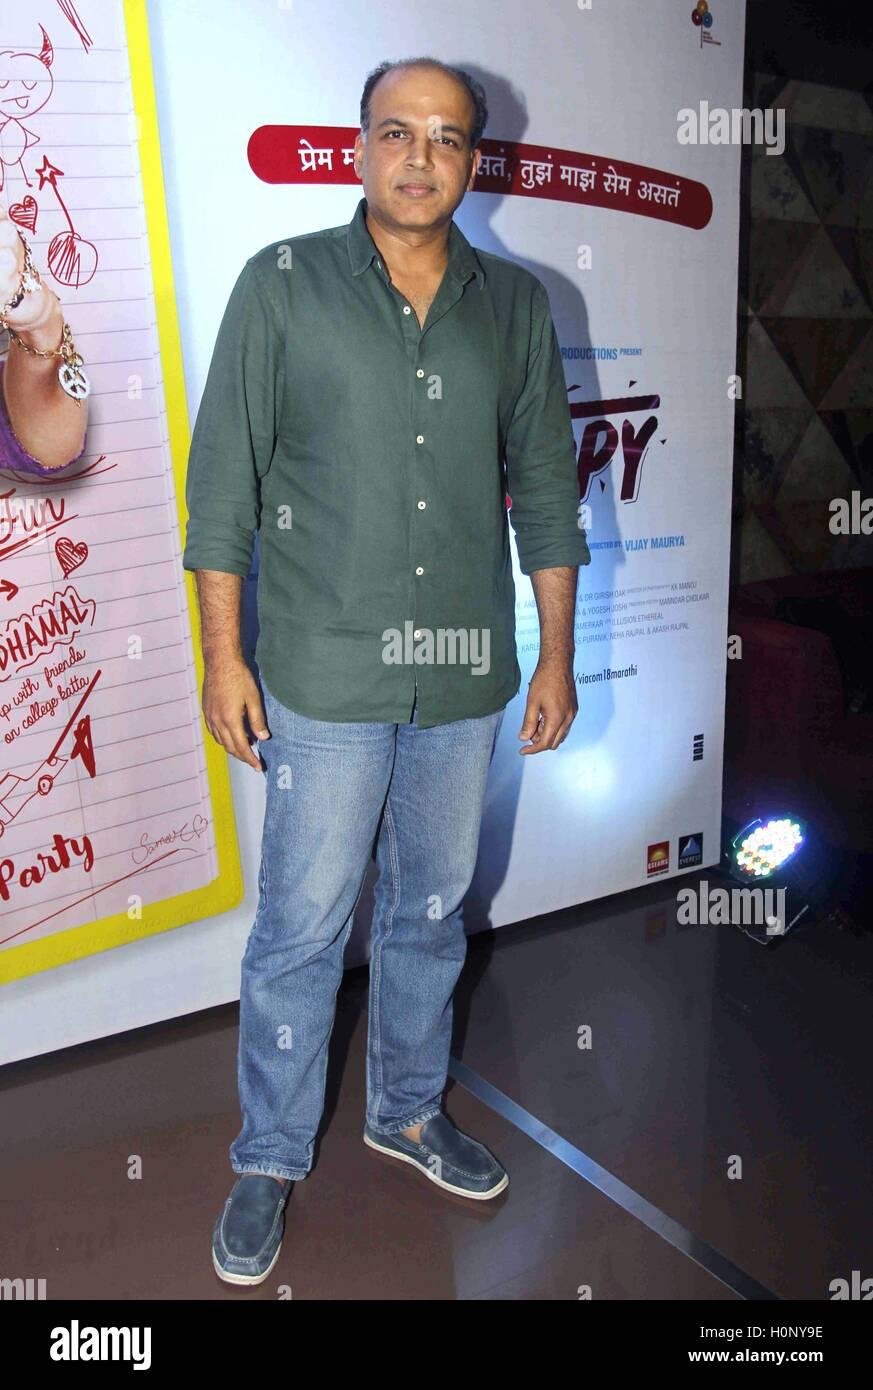 Bollywood filmmaker Ashutosh Gowariker during the screening of Marathi film Photocopy in Mumbai, India on September - Stock Image